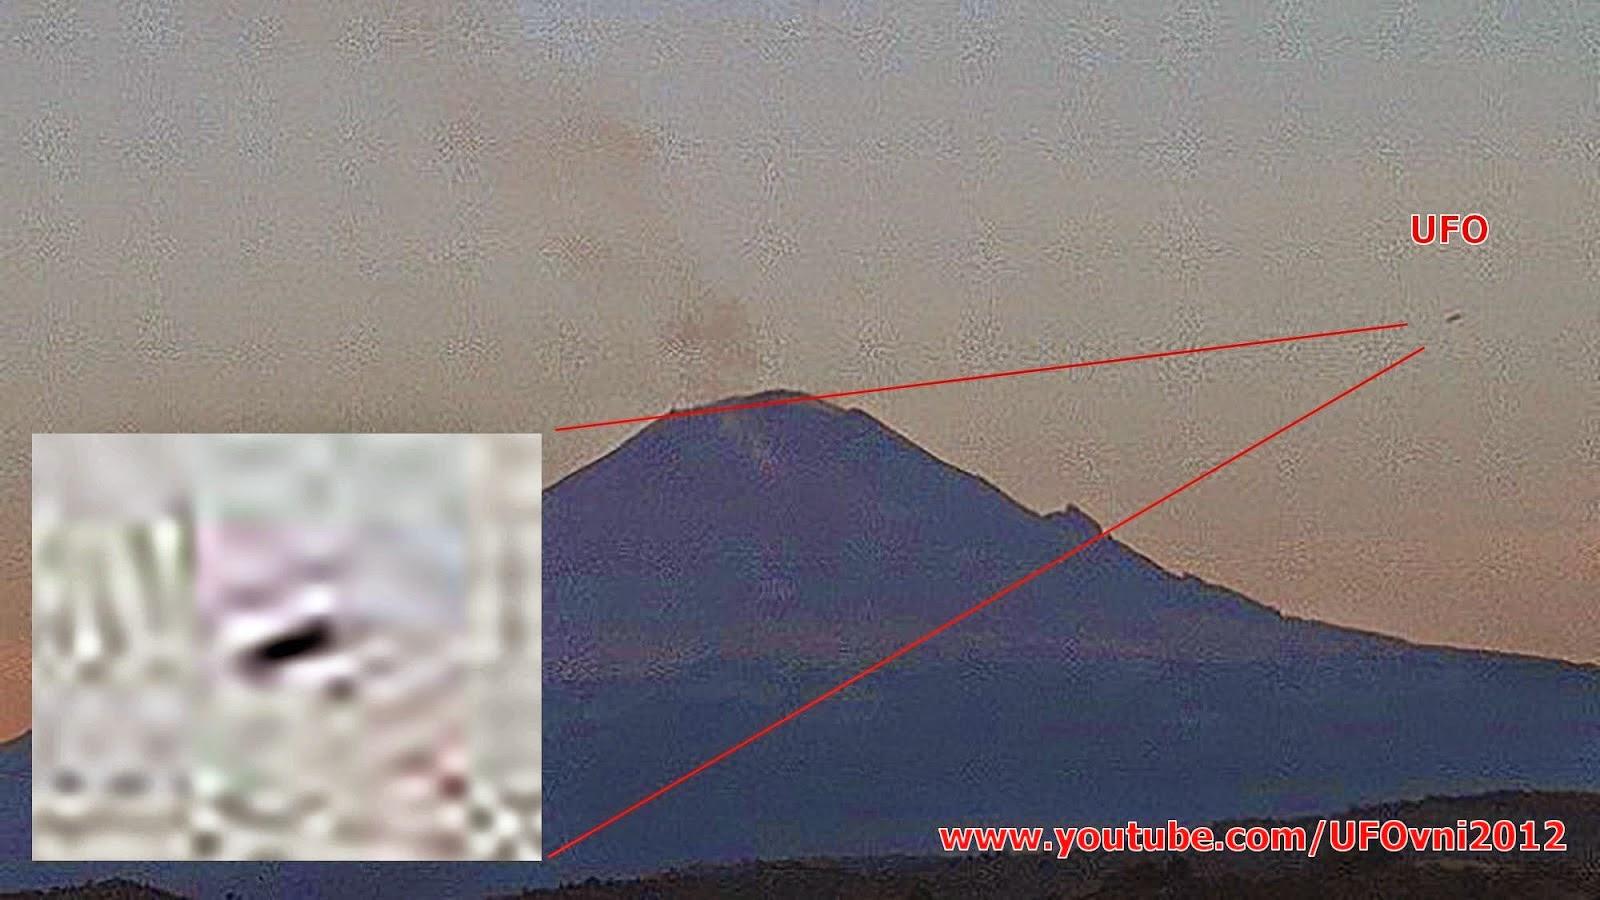 OVNI au-dessus Popocatepetl MEXICO, le 30 novembre 2014 - 06:44